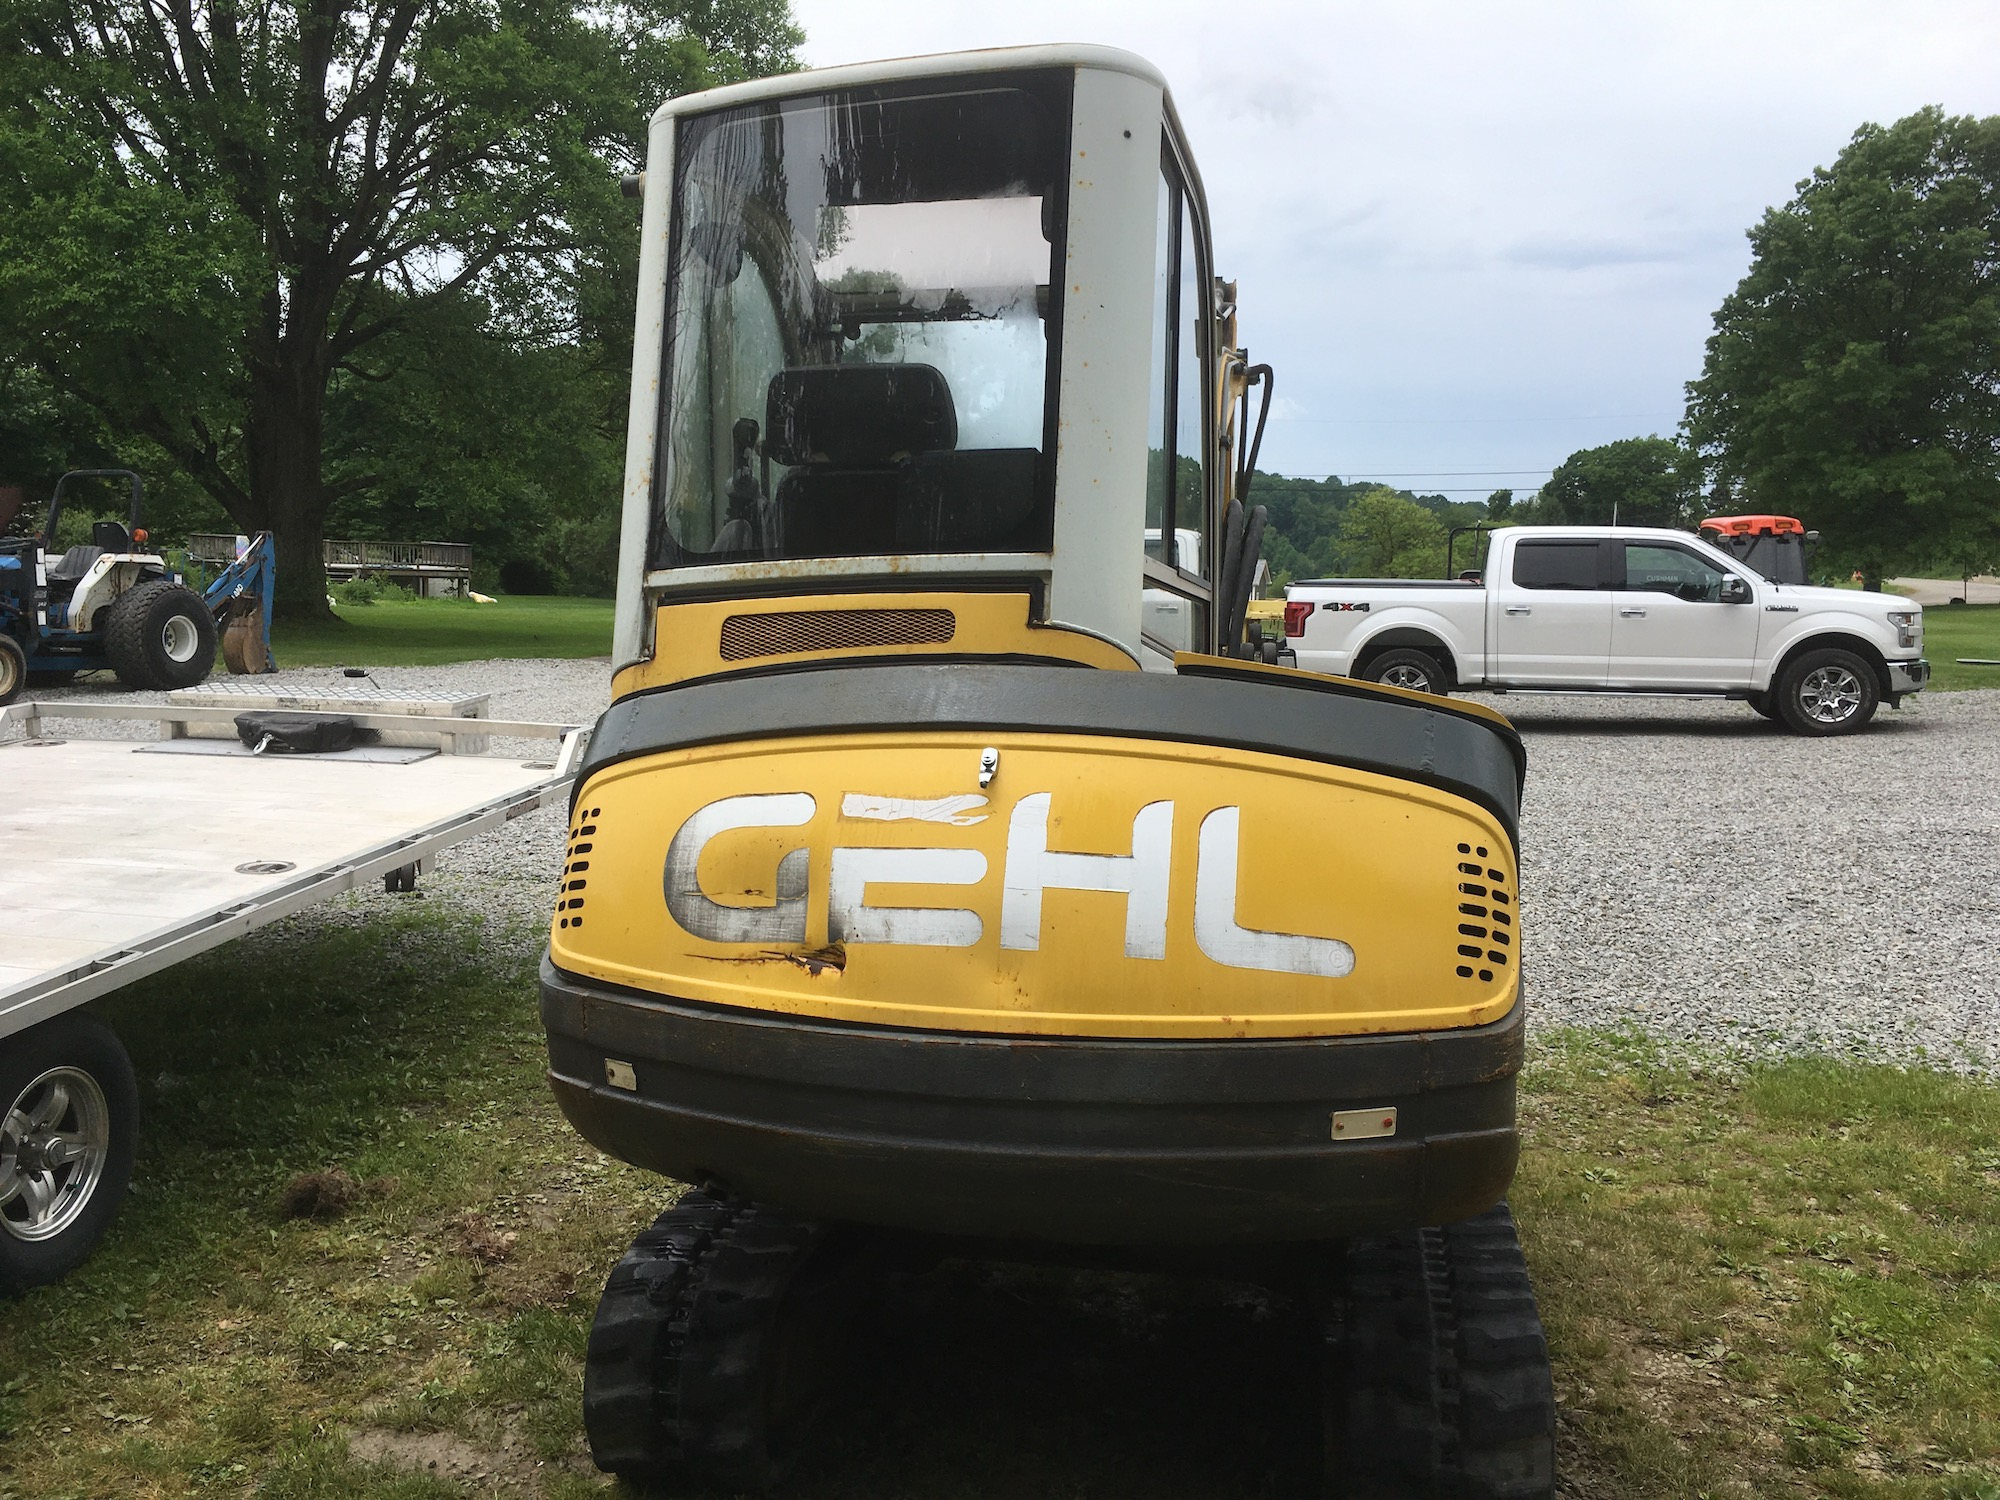 Gehl-GE362-Excavator-03